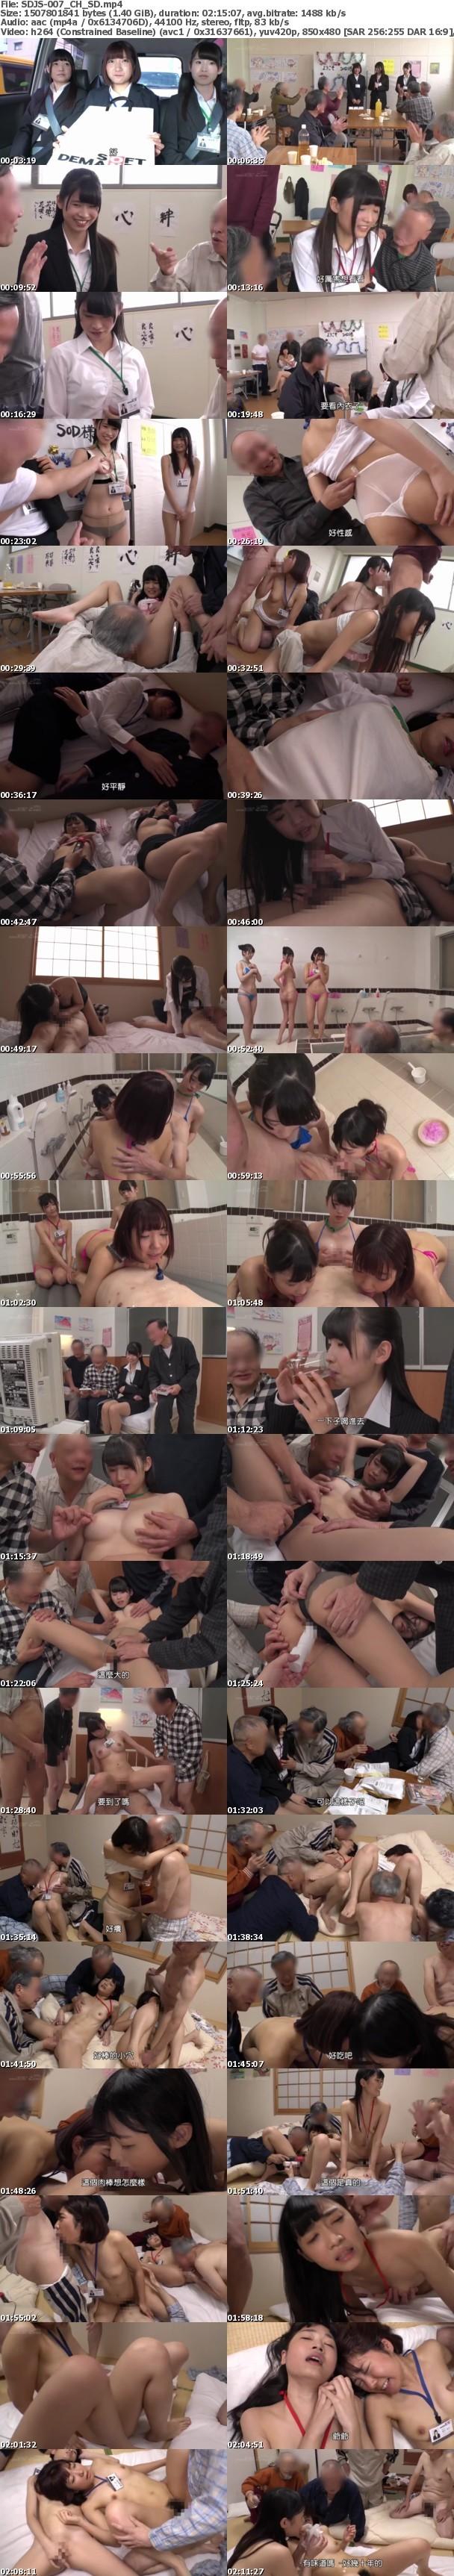 SDJS-007 SOD女員工看護研修 為了調查老年人的需求來到了養老院,被變態性騷擾還被老人集體強姦高潮[中文字幕]